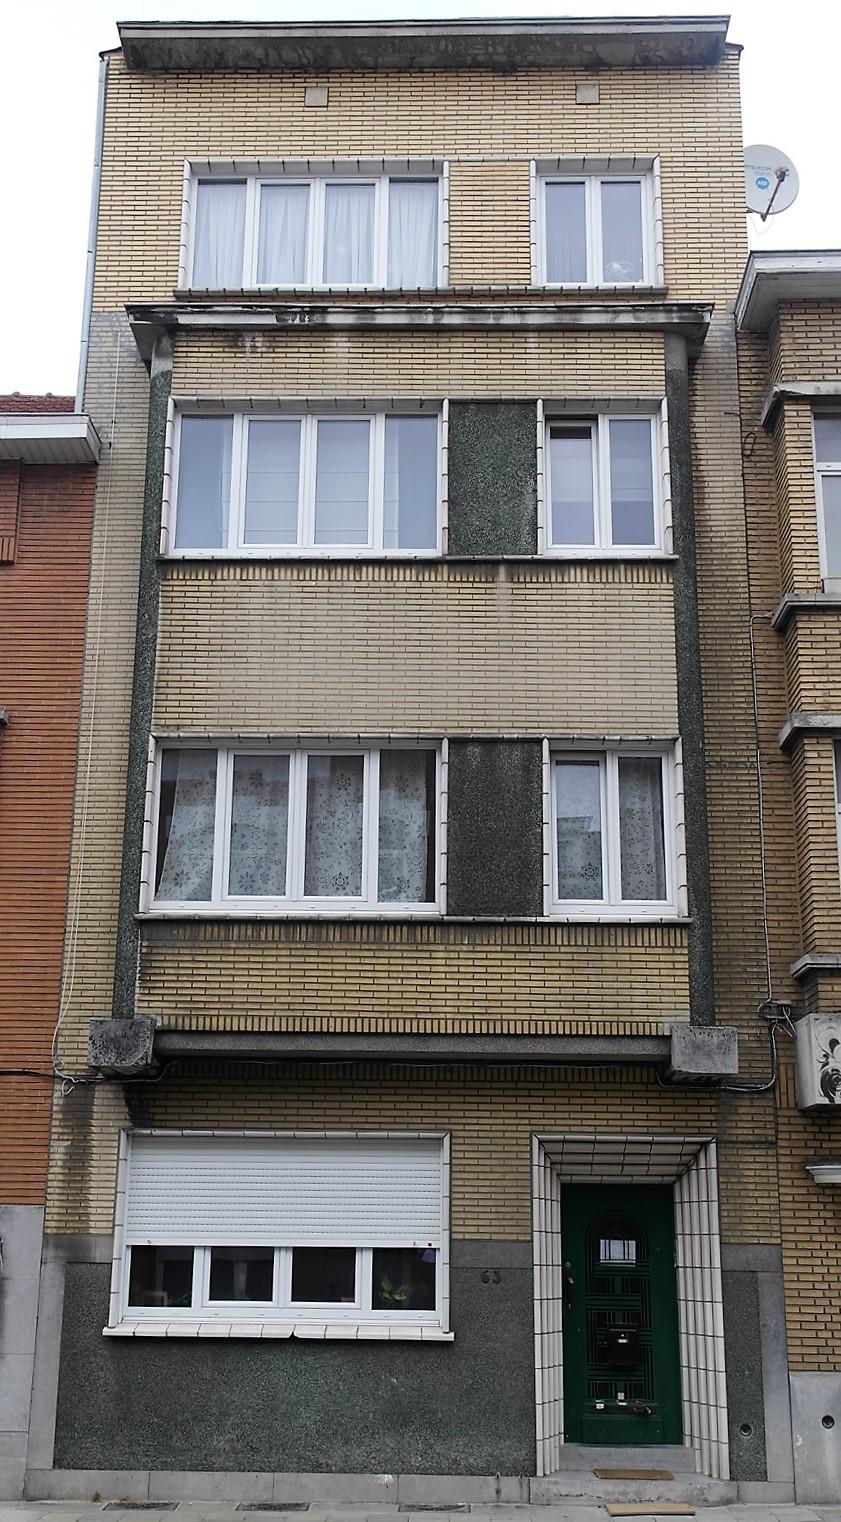 Rue Louis Van Beethoven 63, 2016